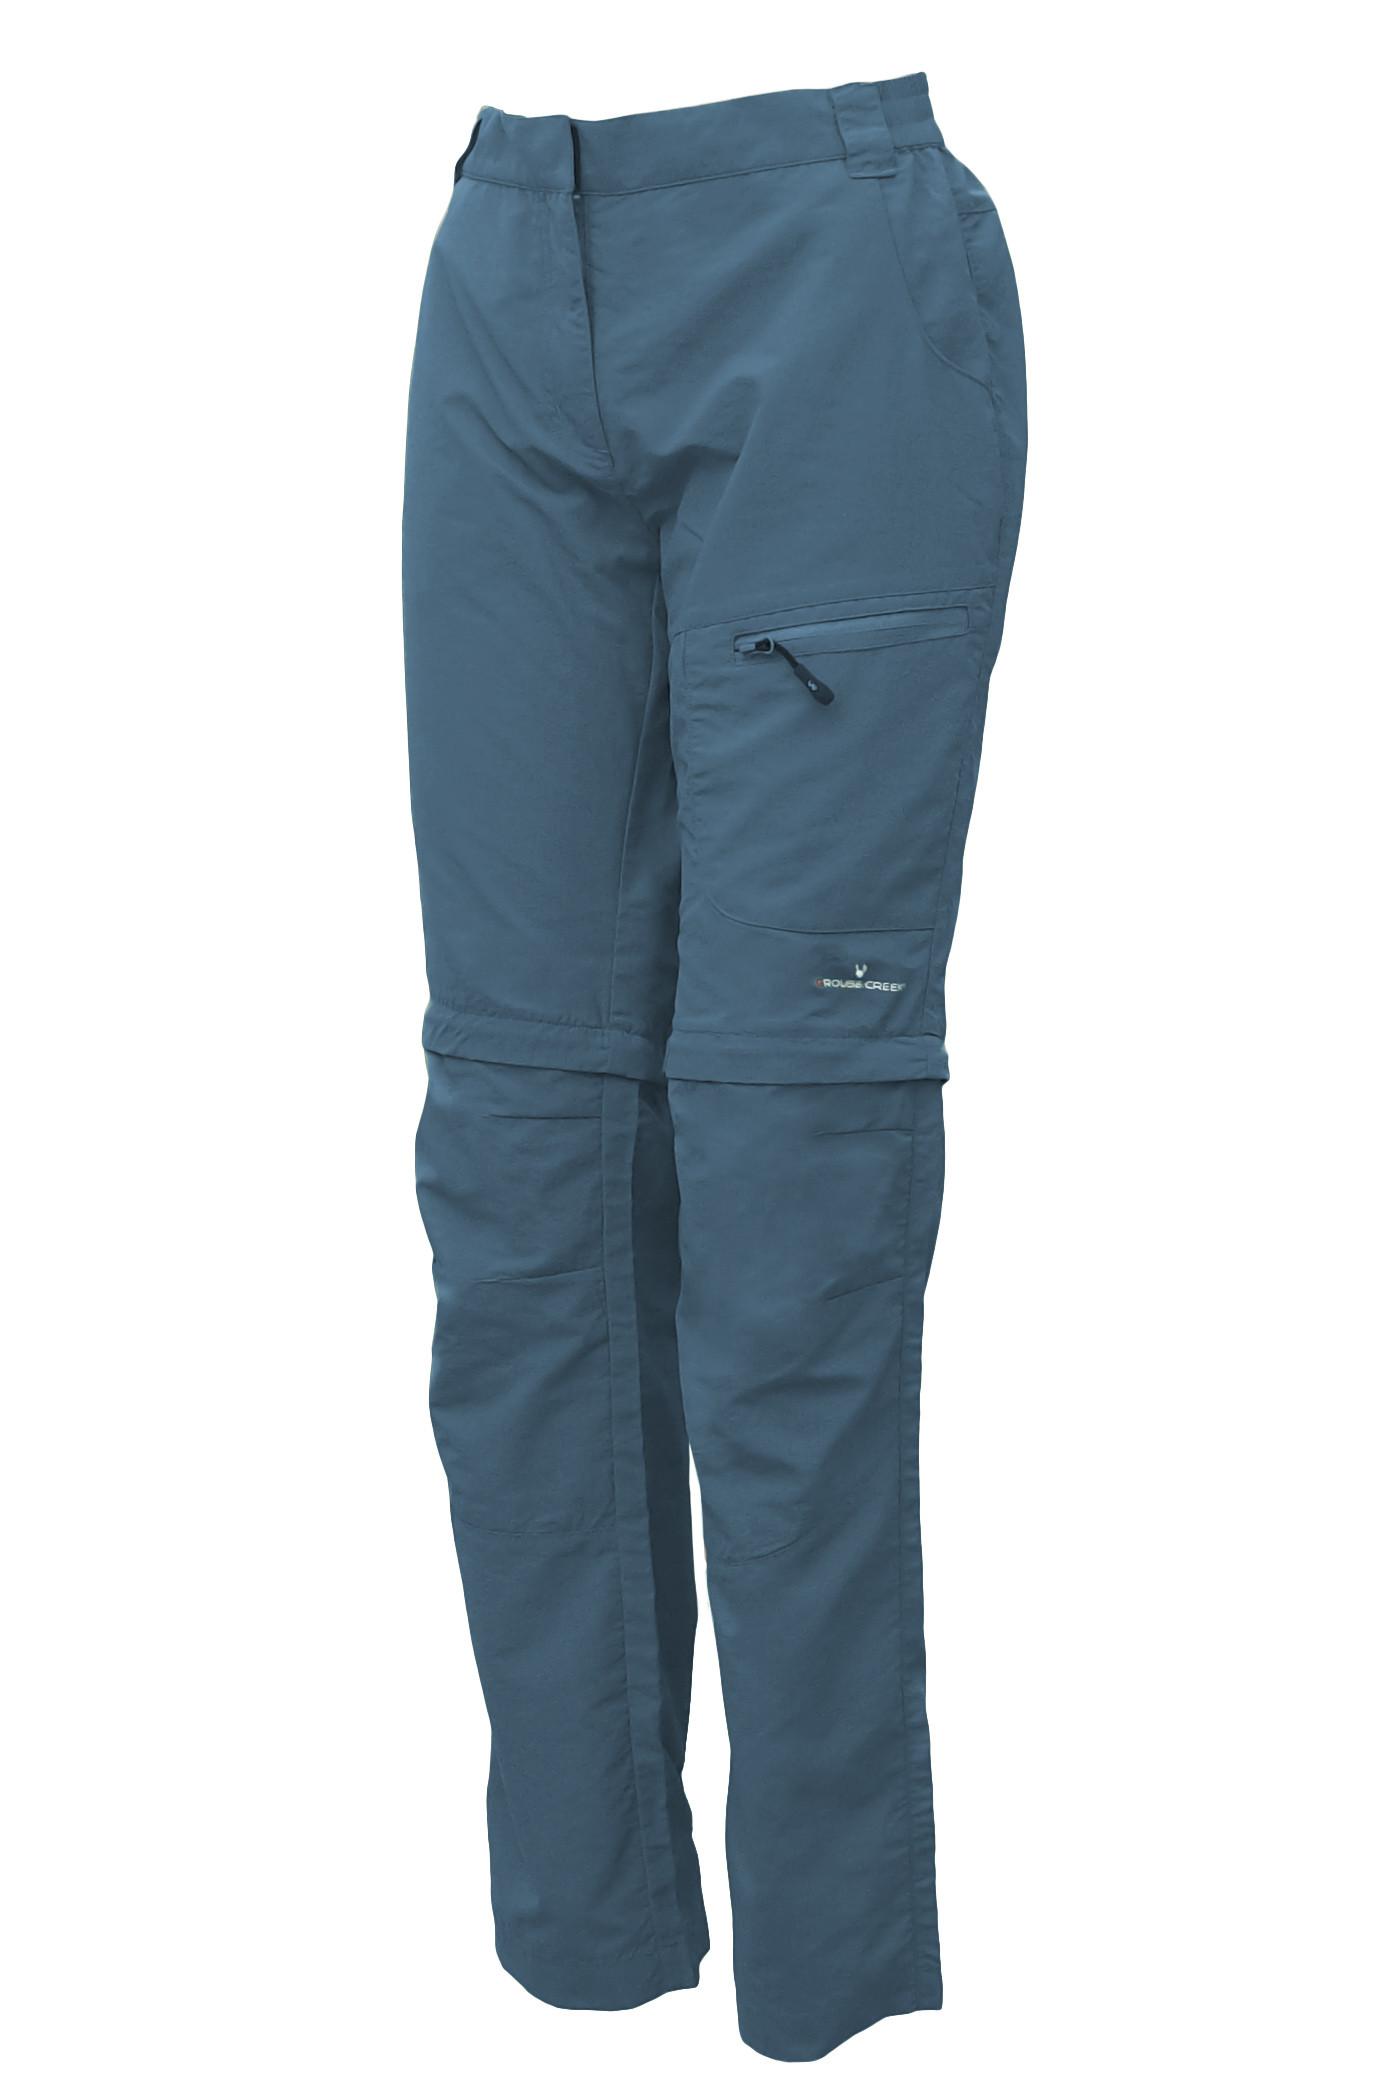 Spodnie Andromeda Zip Off Lady ombre blue